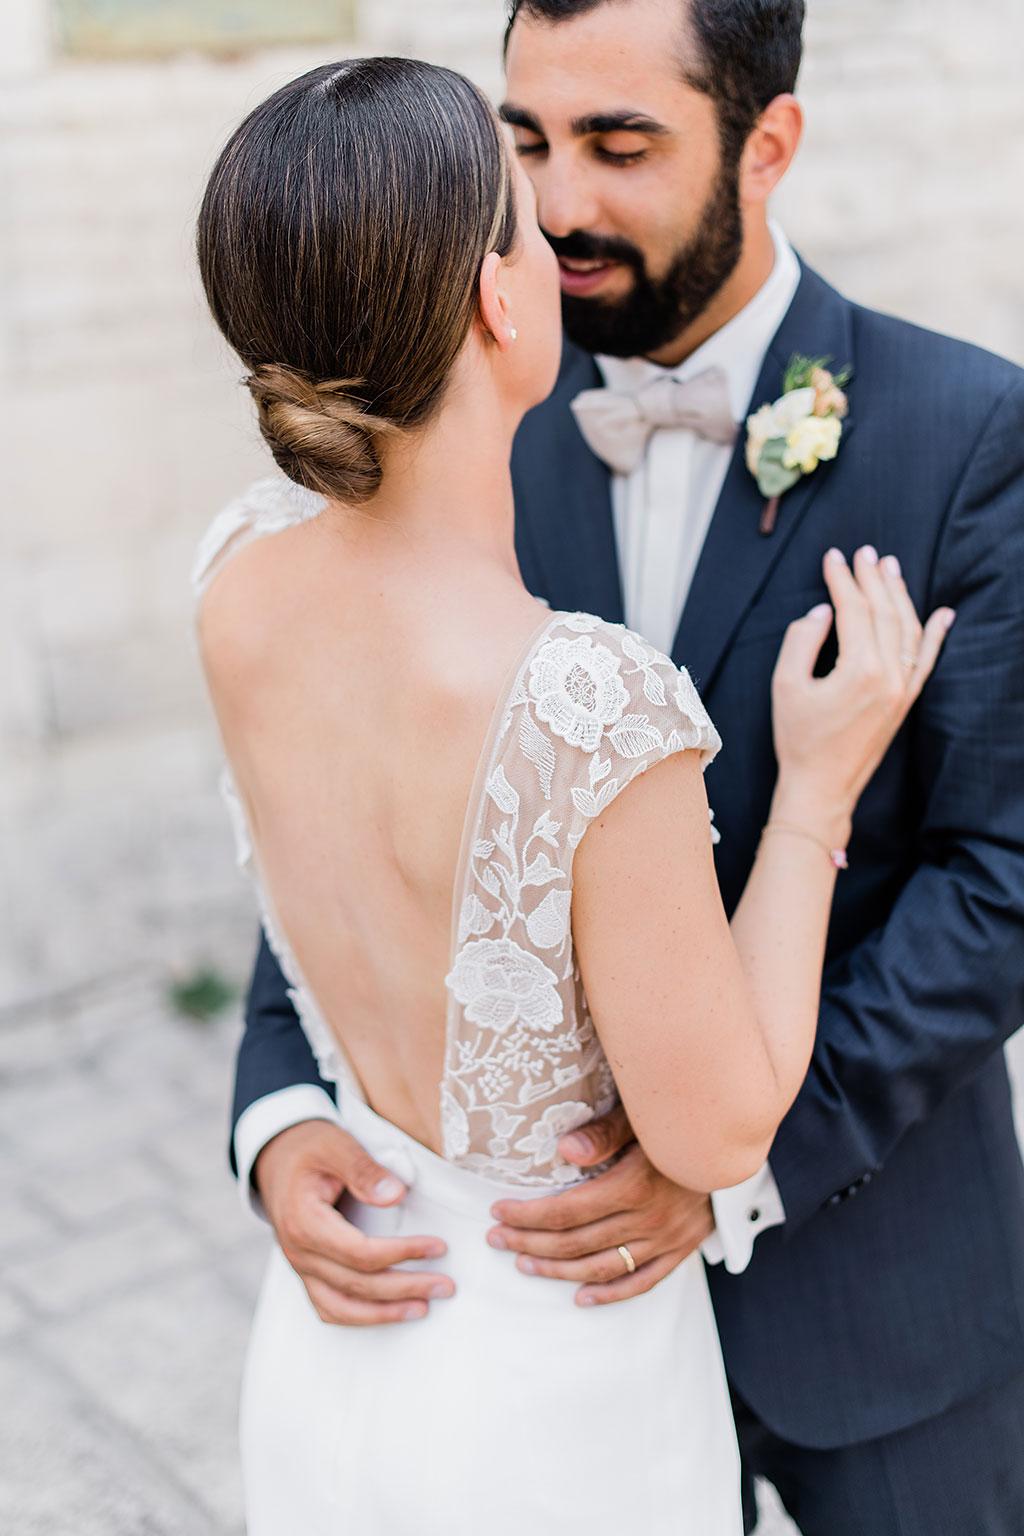 Beautiful wedding dress with floral lace, Φωτογράφος γάμου Χαλκιδική